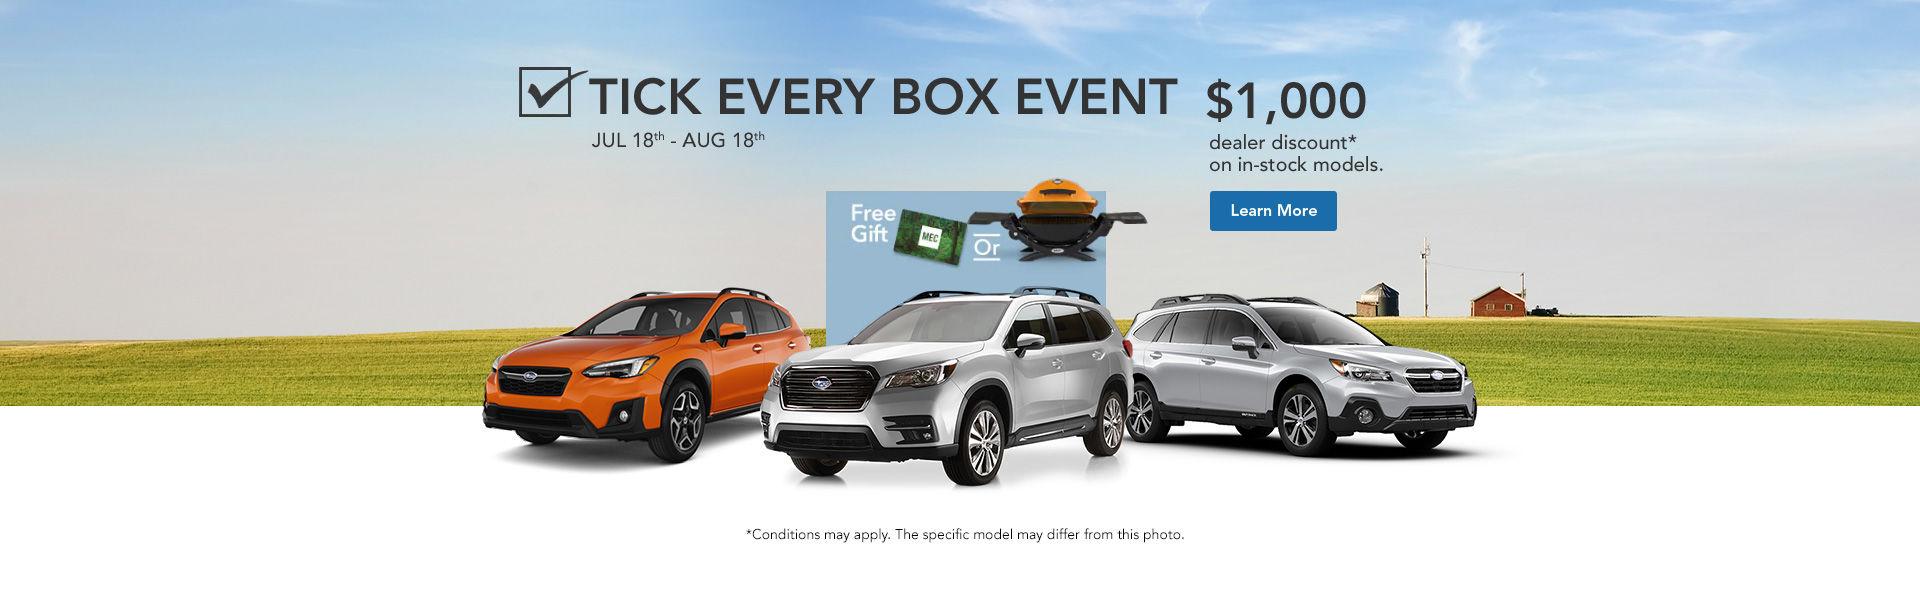 Tick Every Box Event